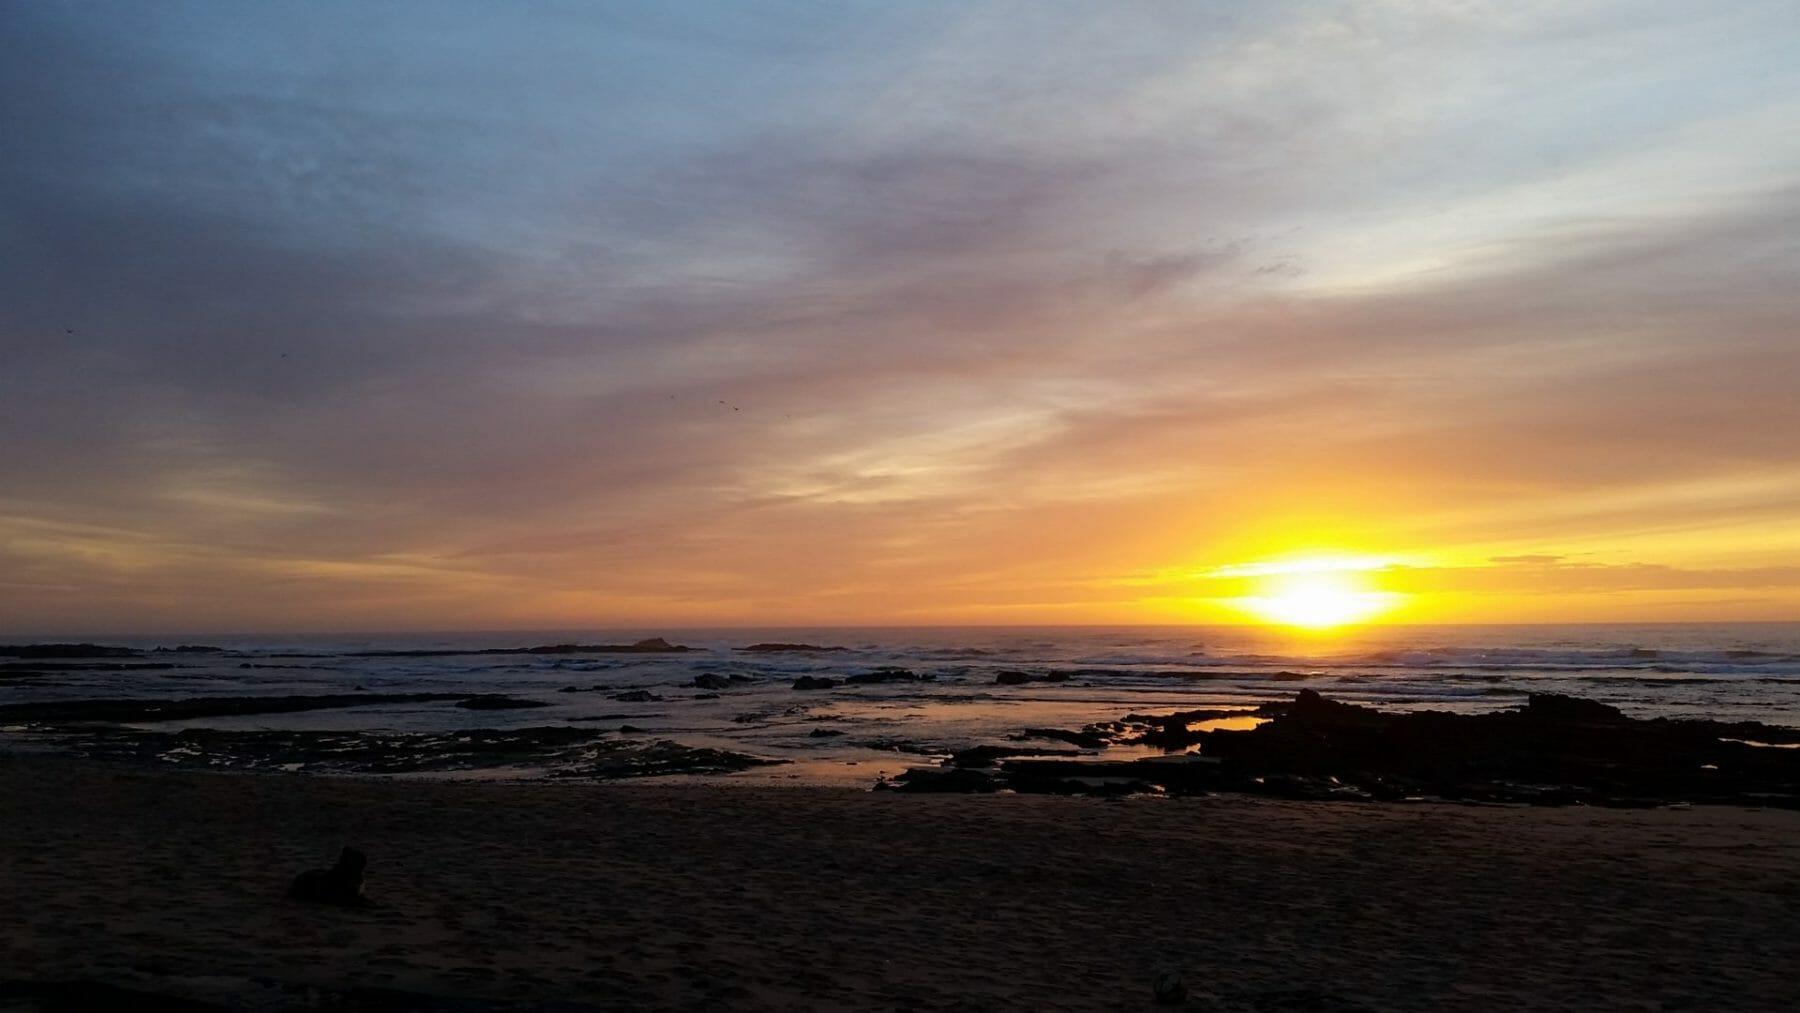 Tai Chi Urlaub am Meer - Sonnenuntergang im Meer